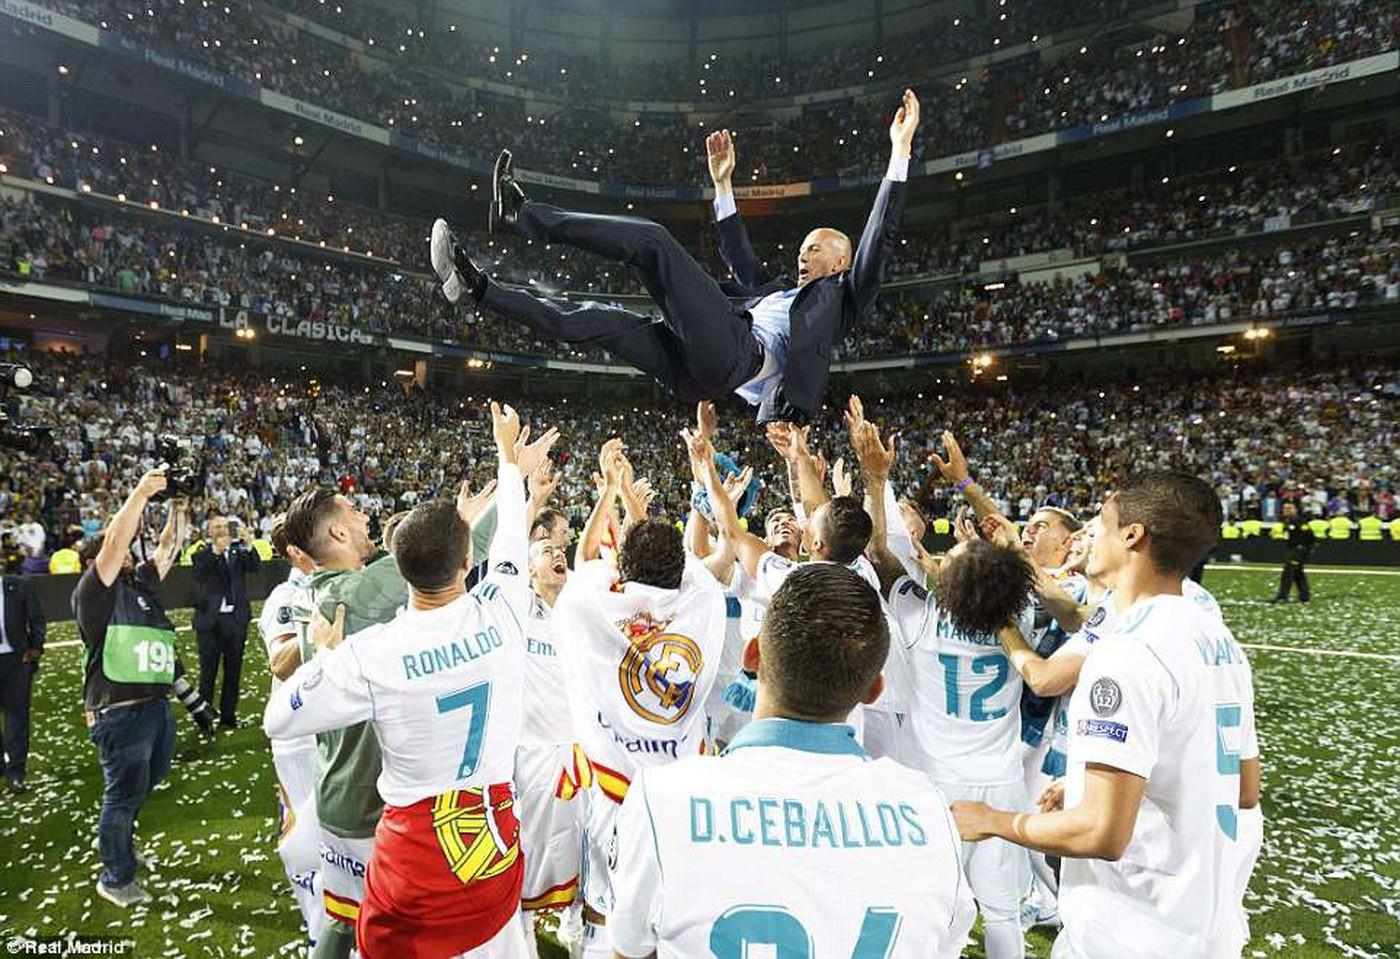 Zinedine Zidane: Lịch sử Real Madrid gọi tên - Ảnh 1.